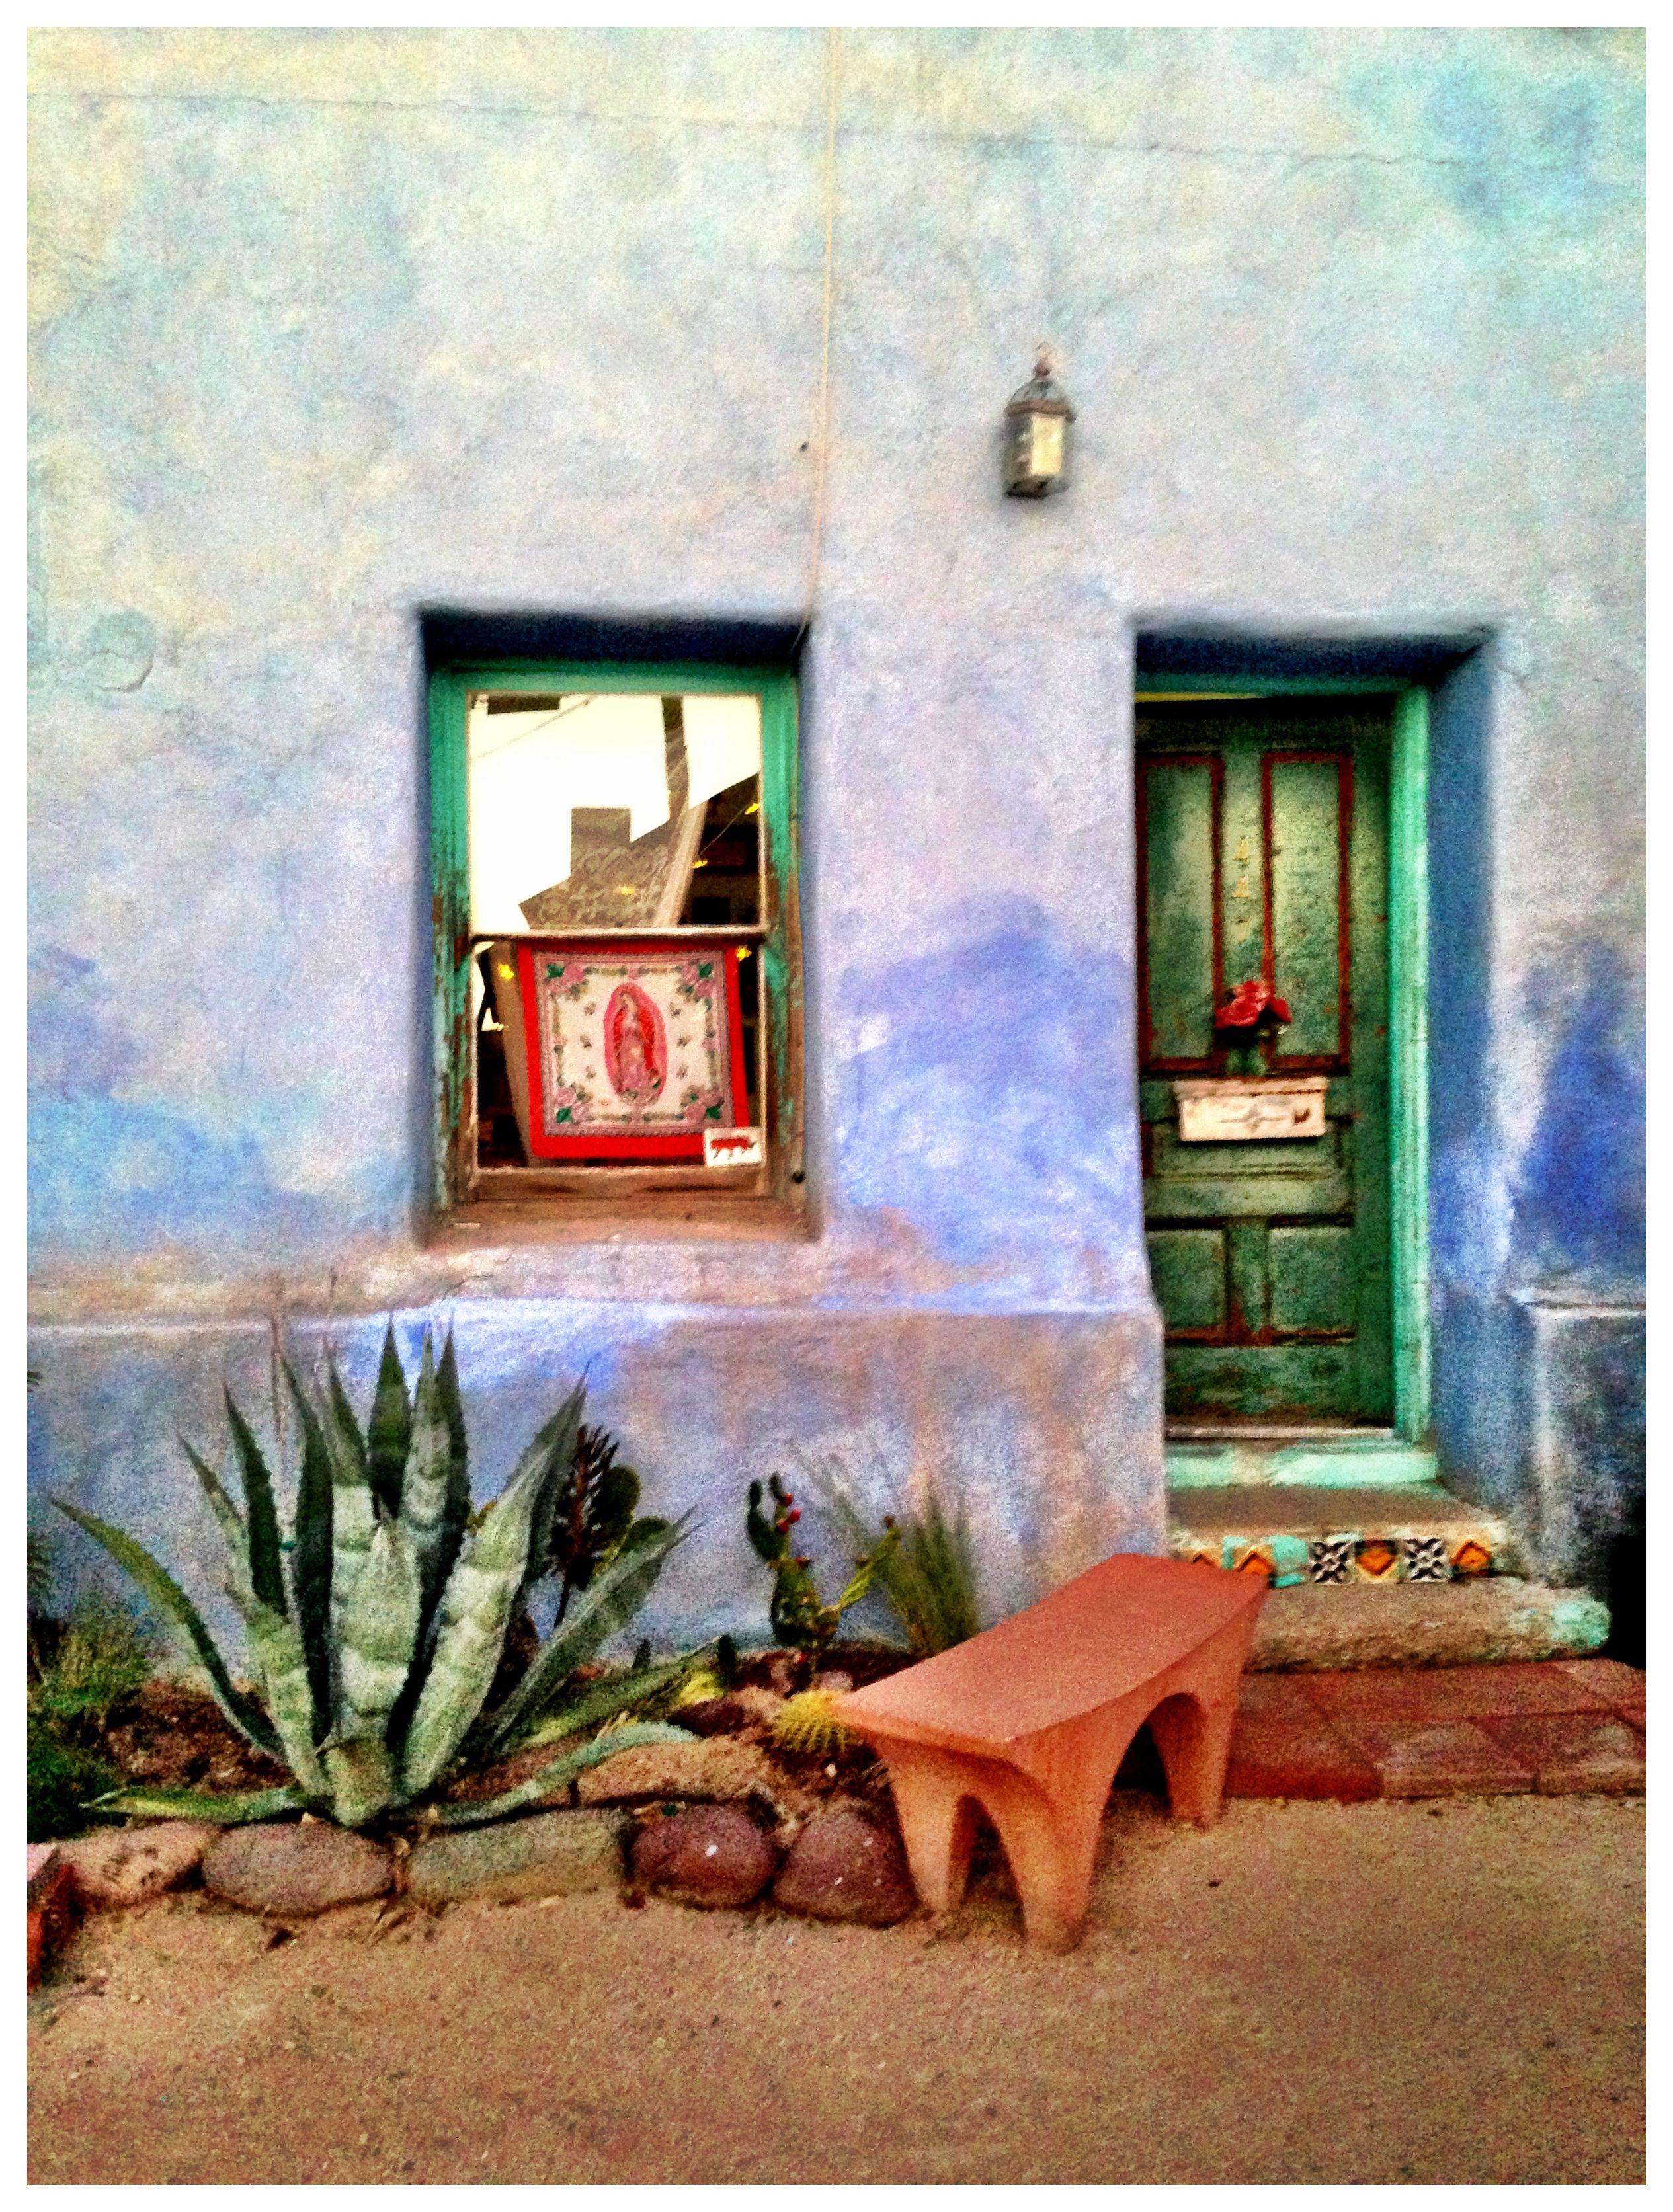 Barrio viejo tucson arizona photo by carina auler barrio in